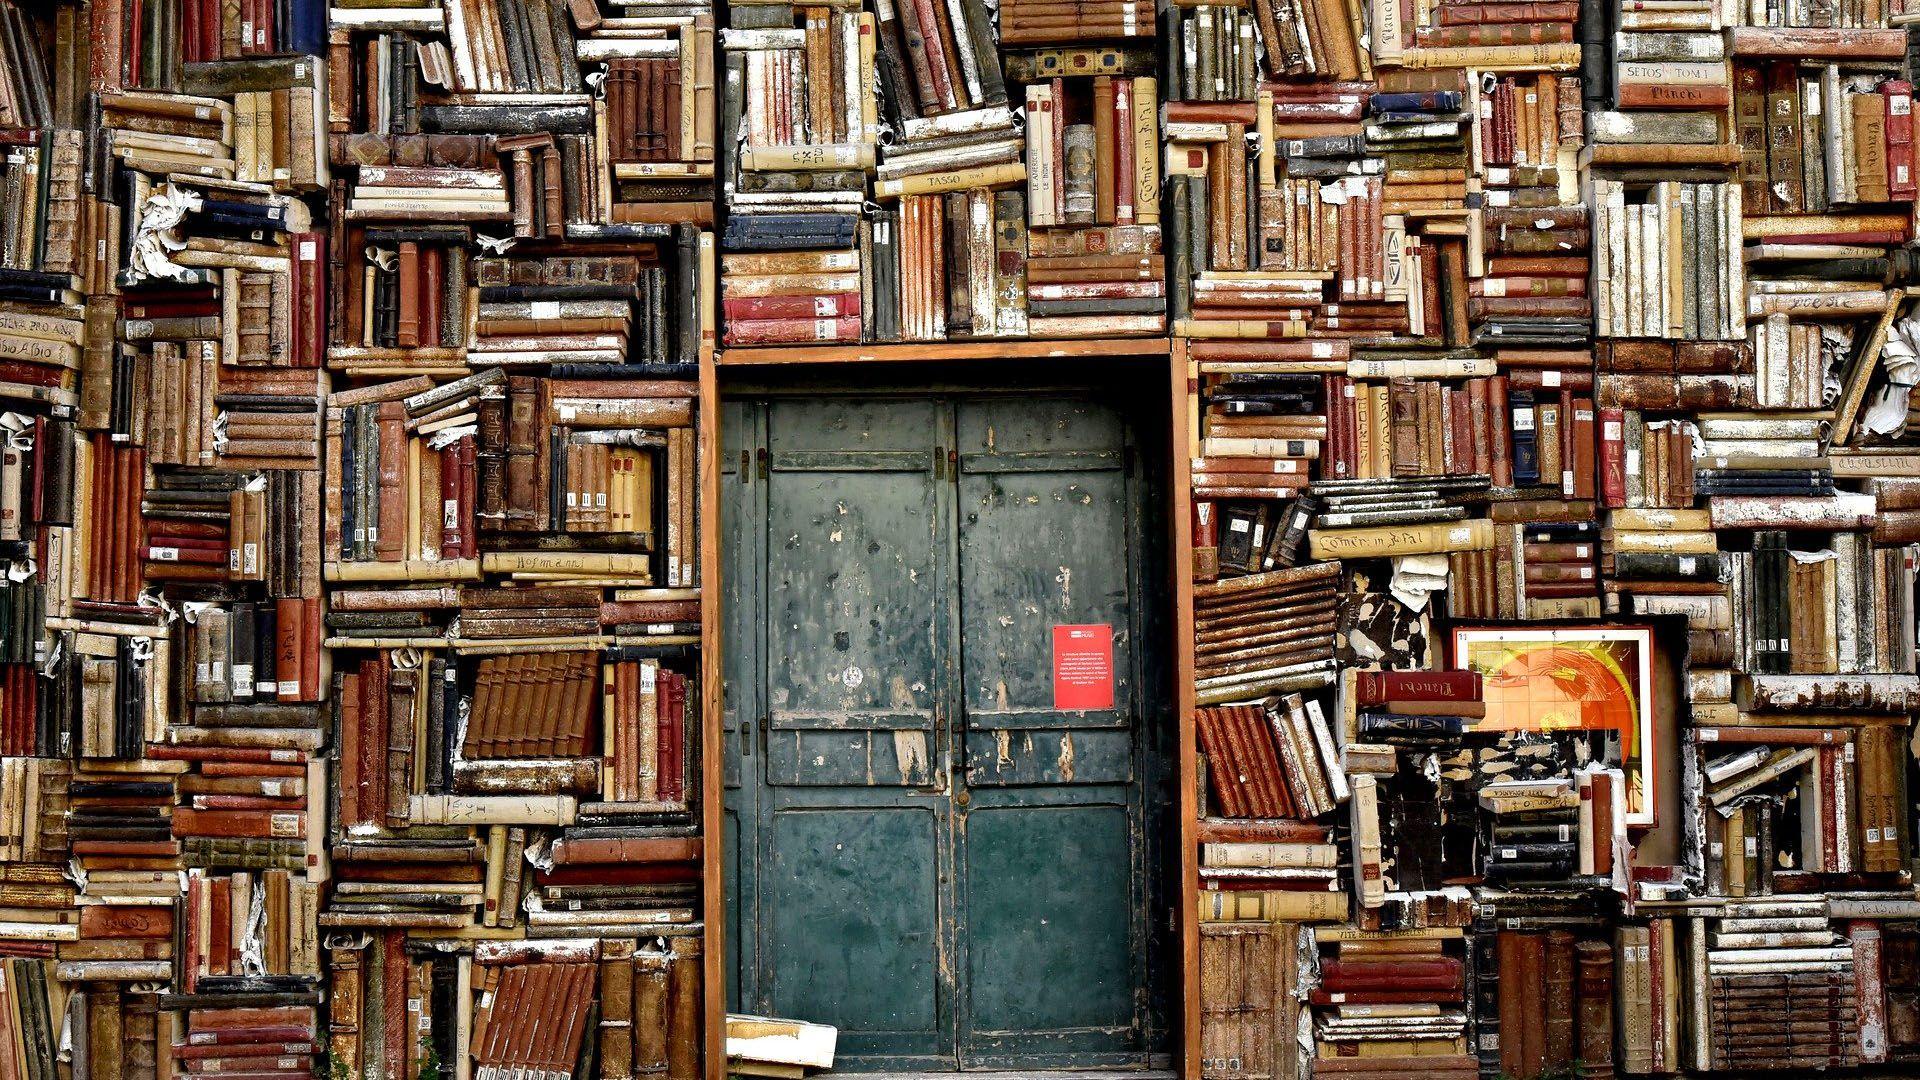 escritores libros bibliotecas